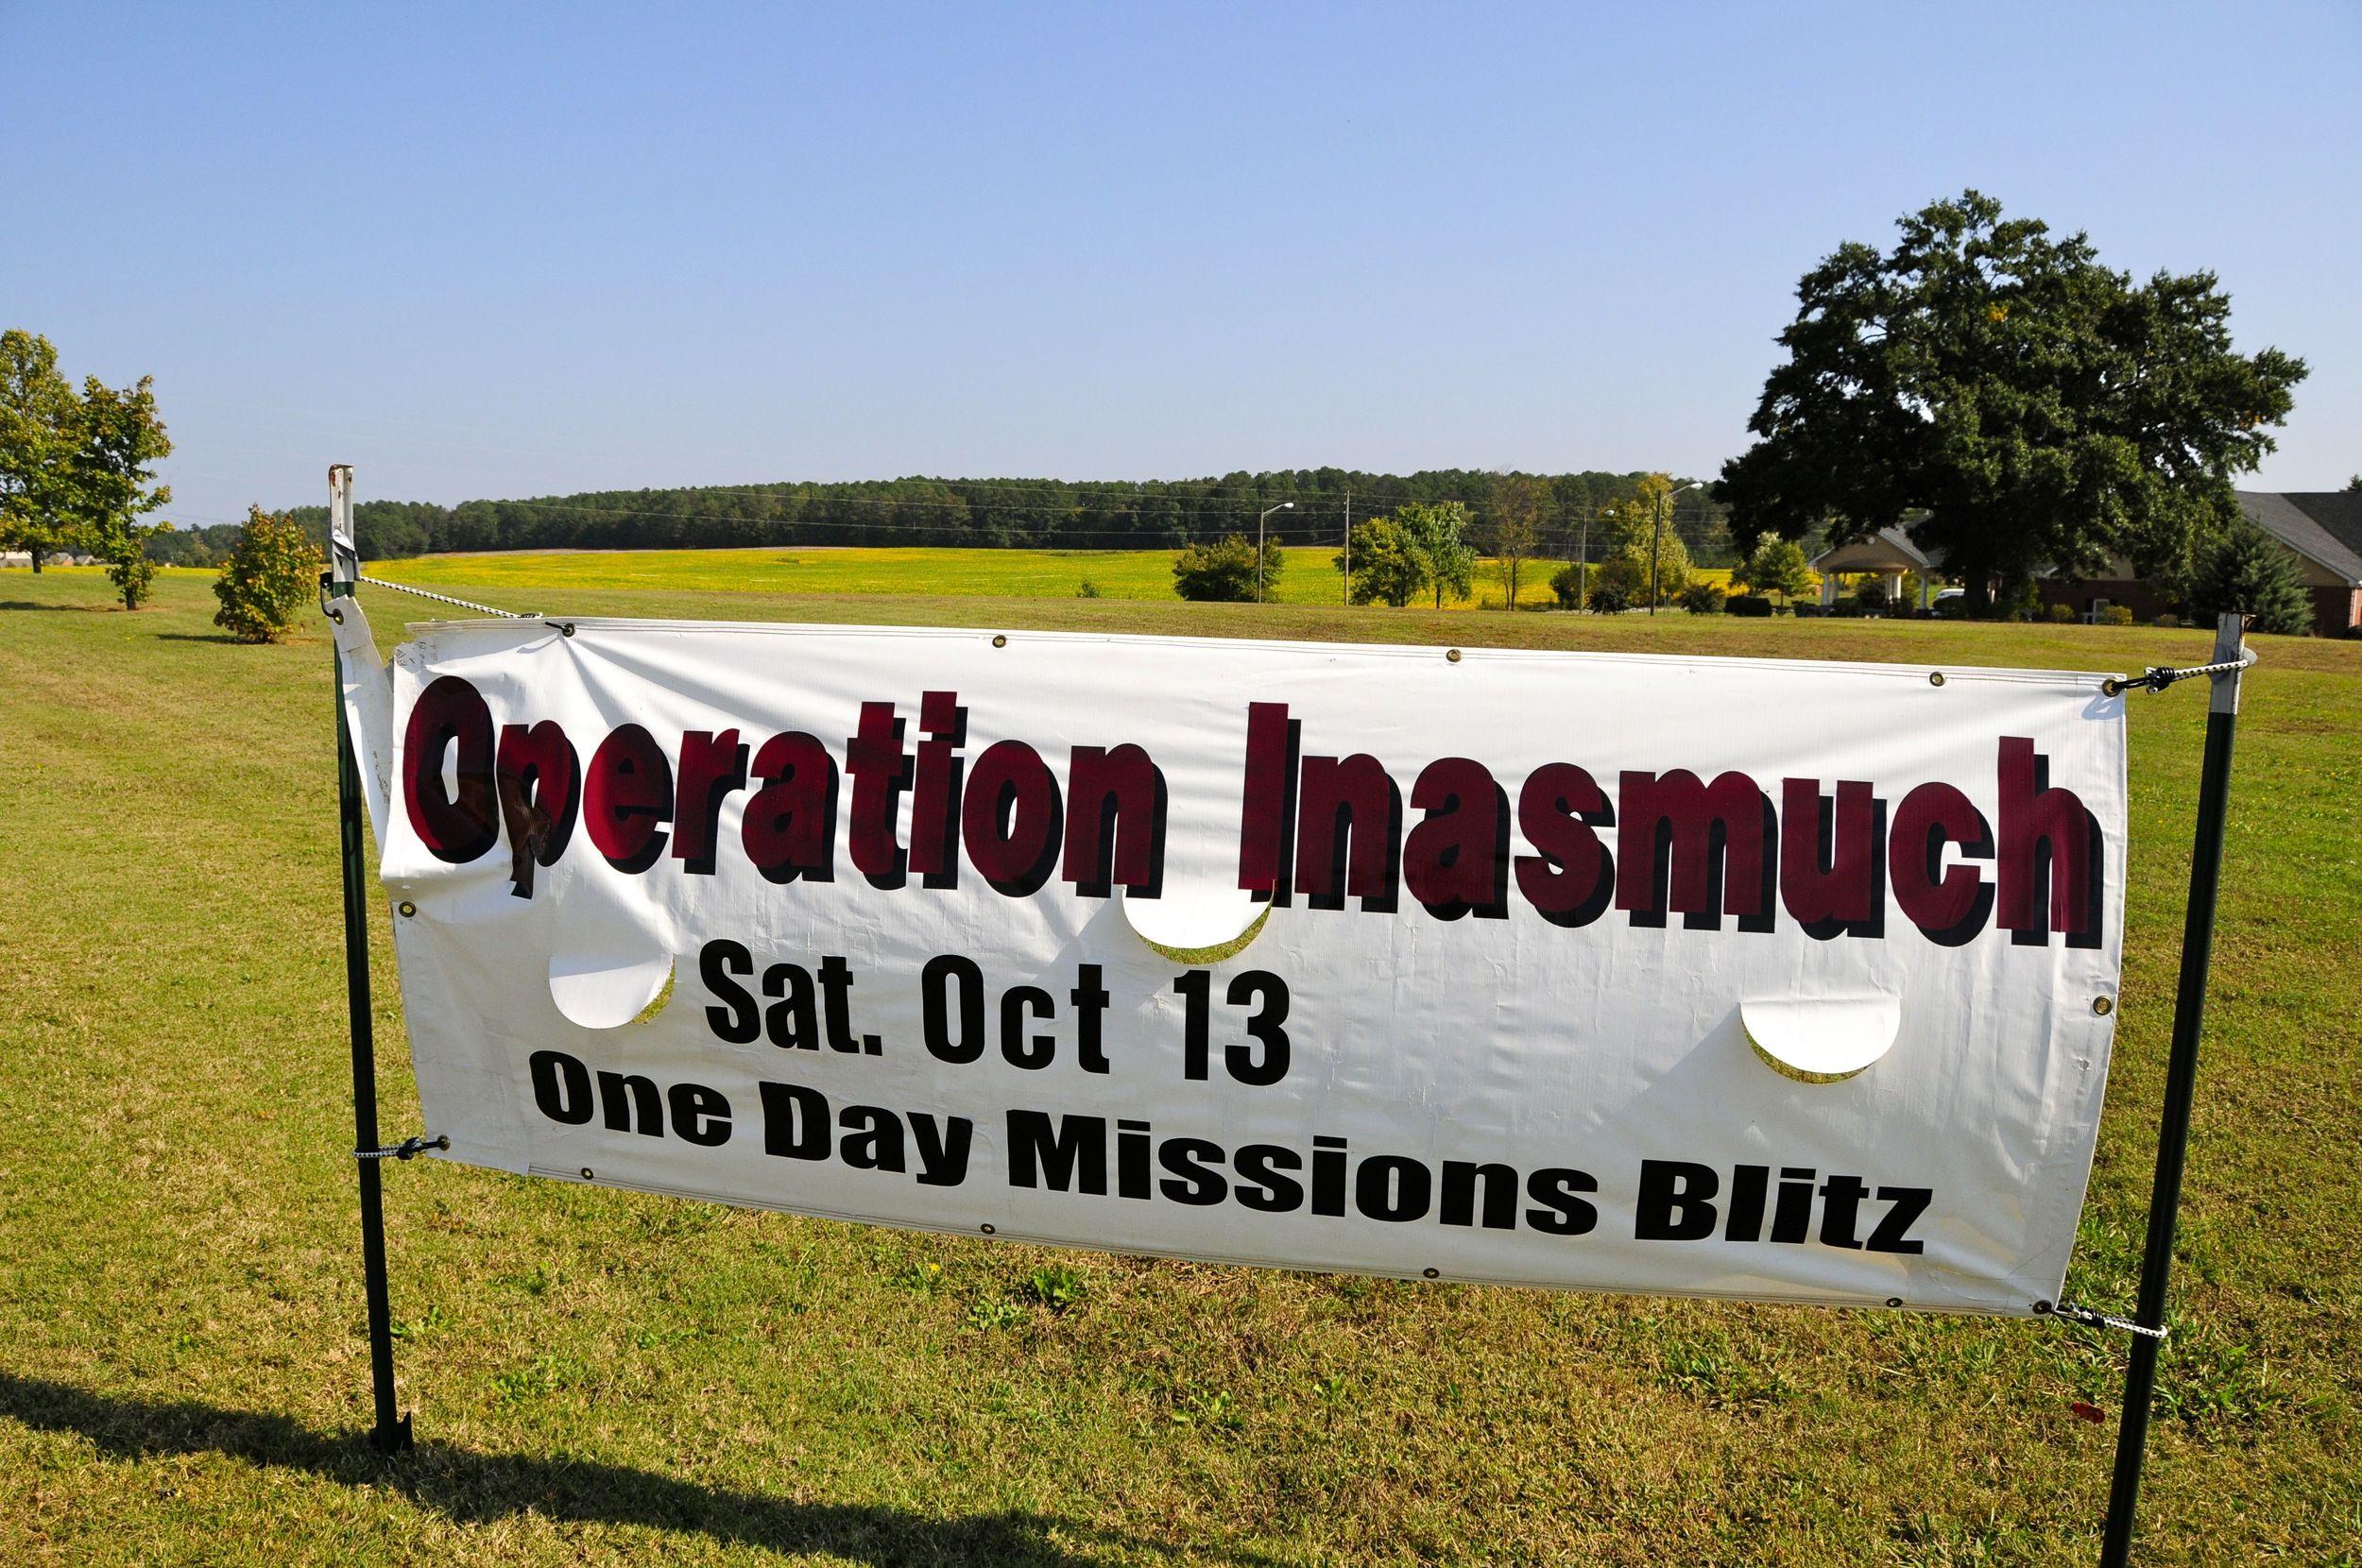 2012 Operation Inasmuch sign.jpg